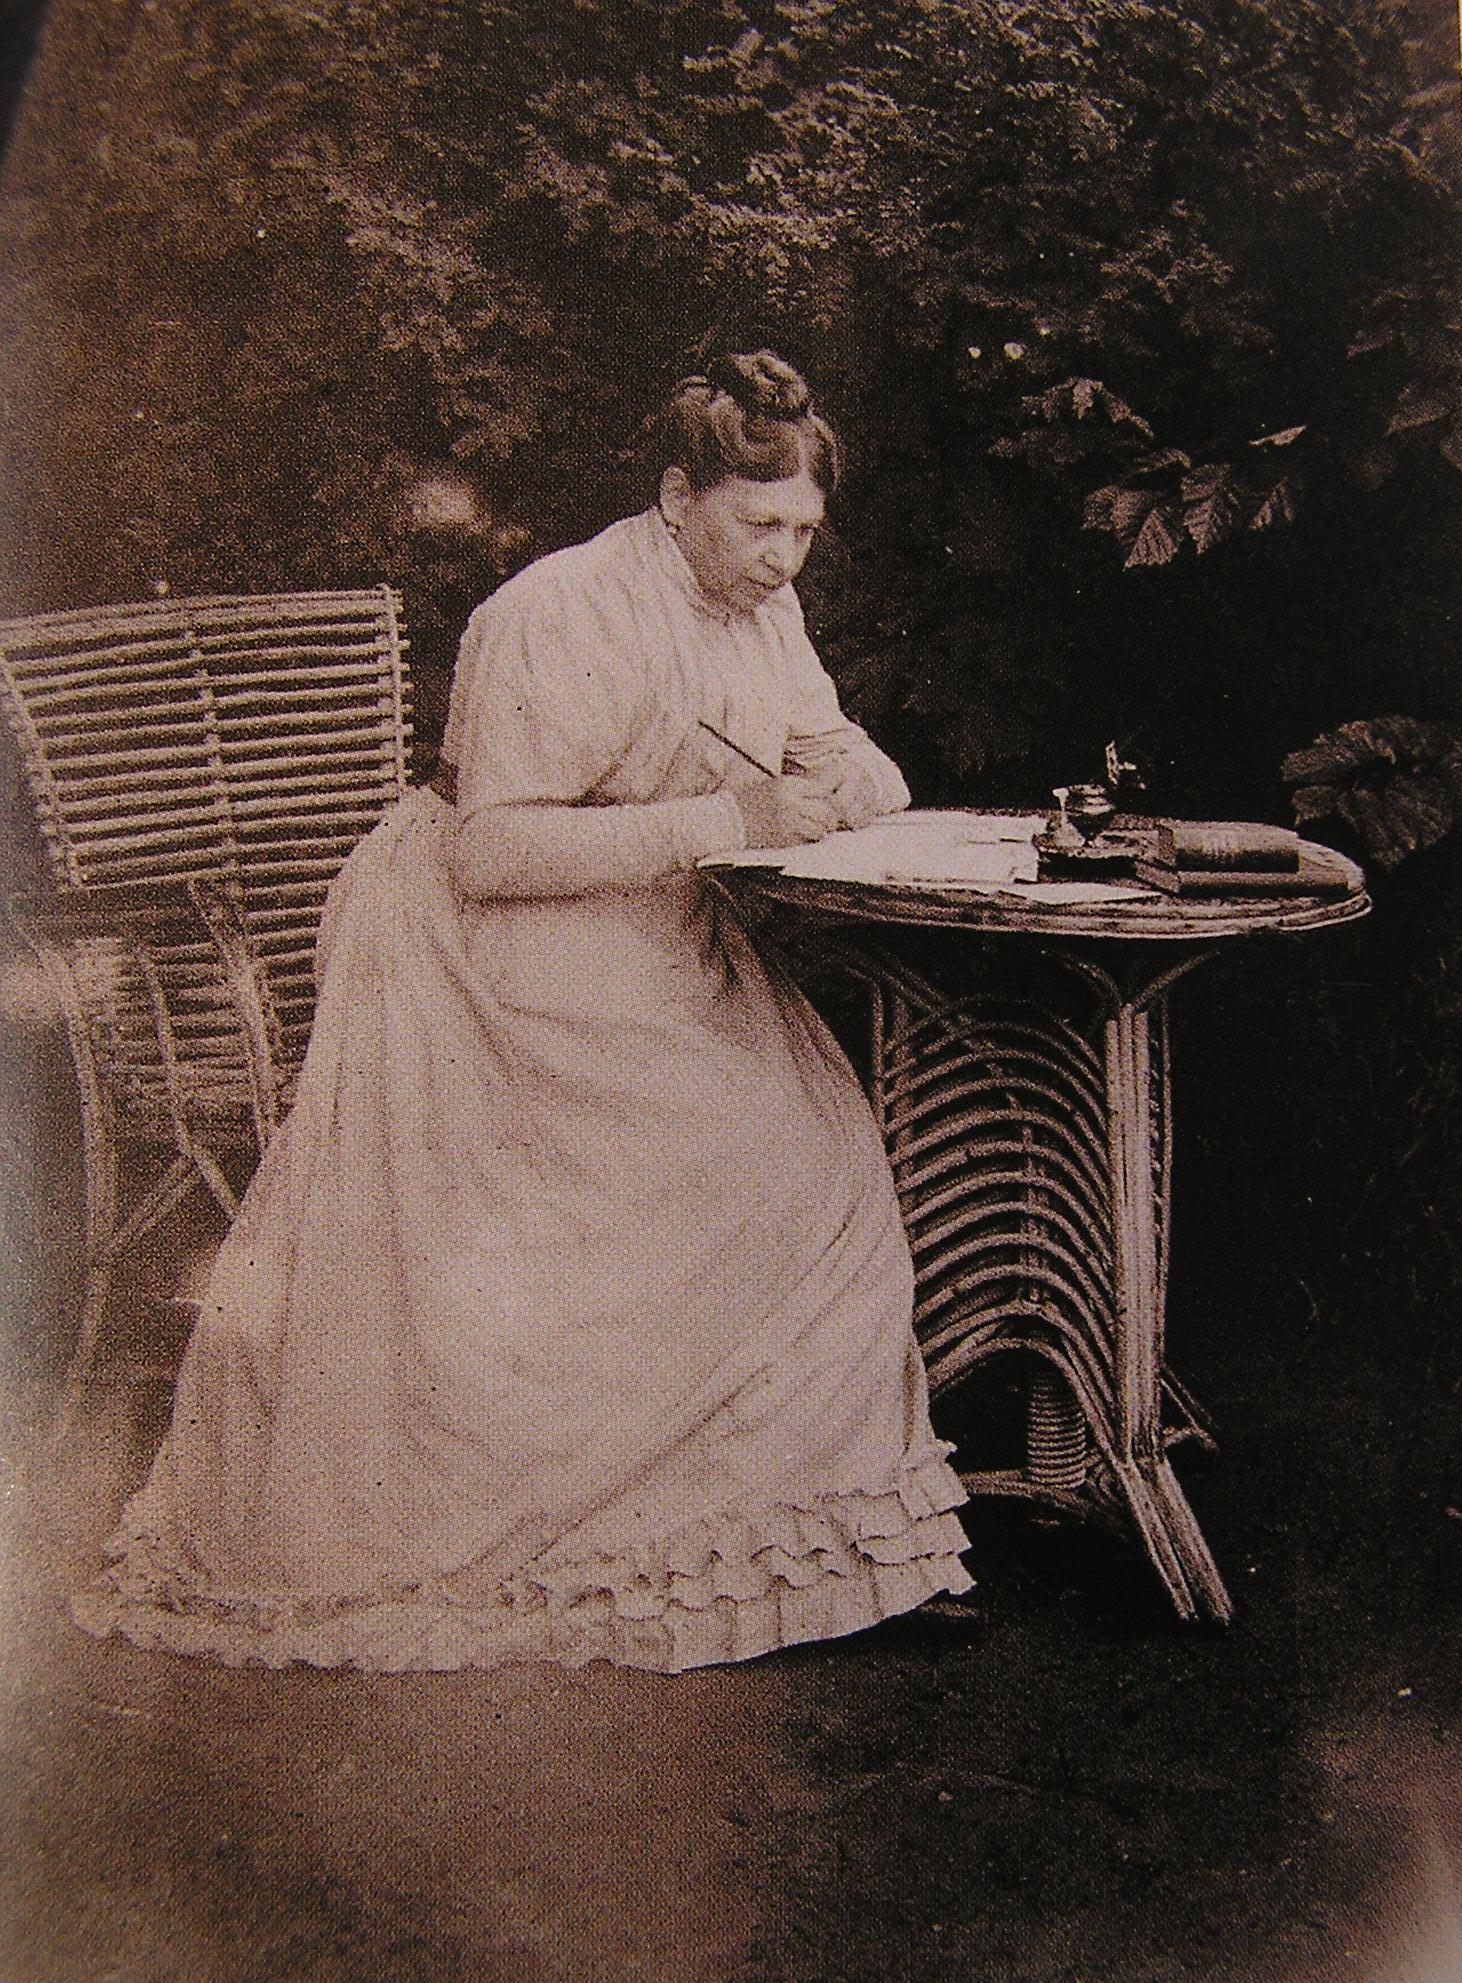 Sophia Tolstaya, circa 1900 (via    Wikimedia Commons   )